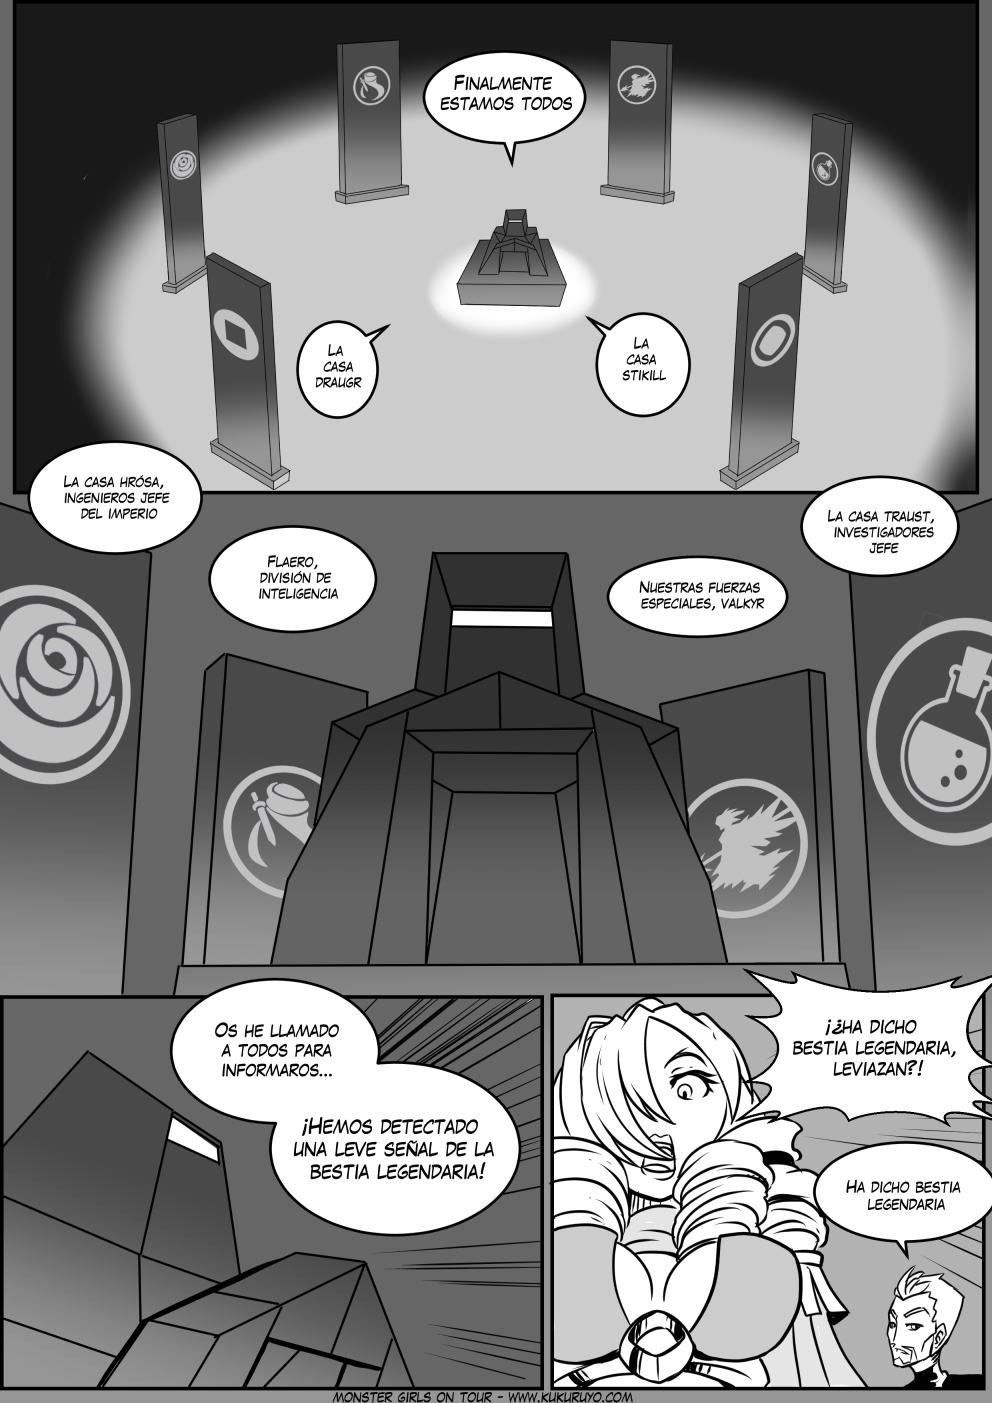 96. Neon Genesis Imperio